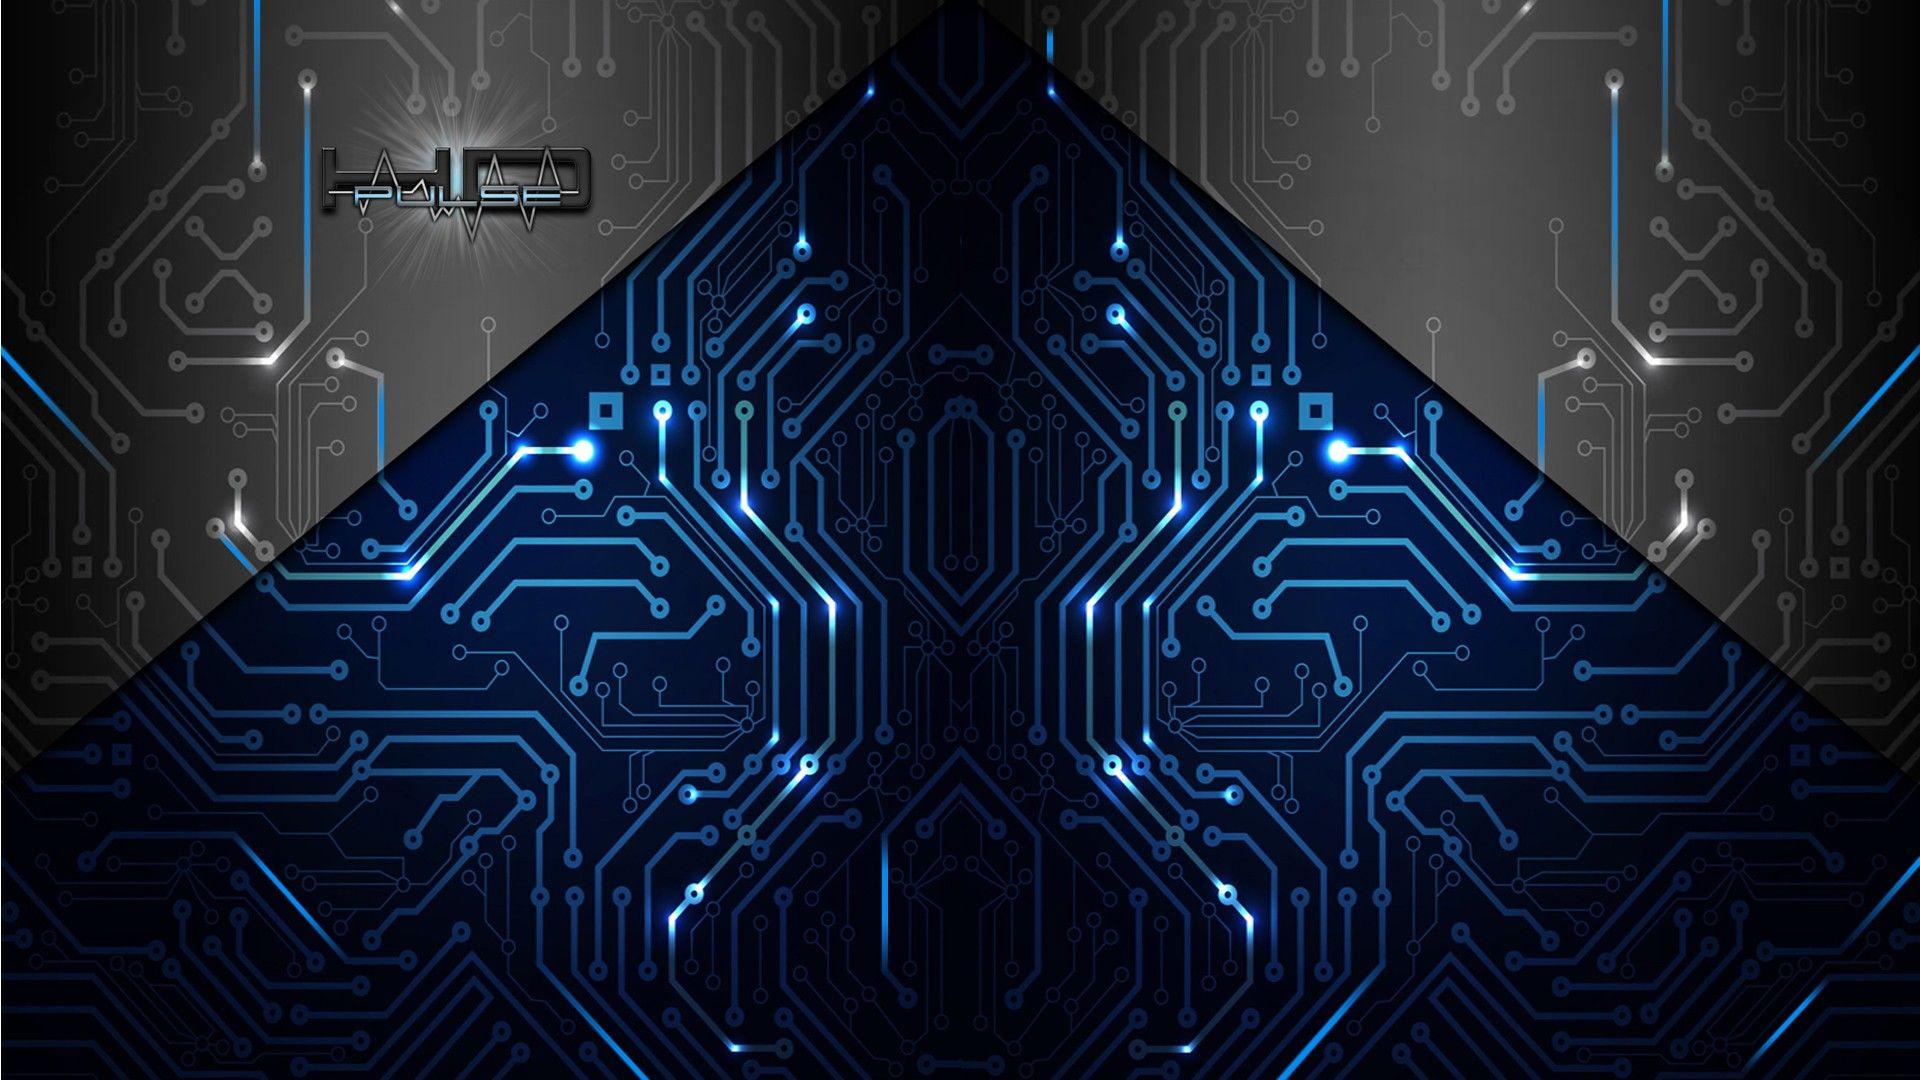 Electronic Circuit Wallpapers Group × Circuit Board Обои